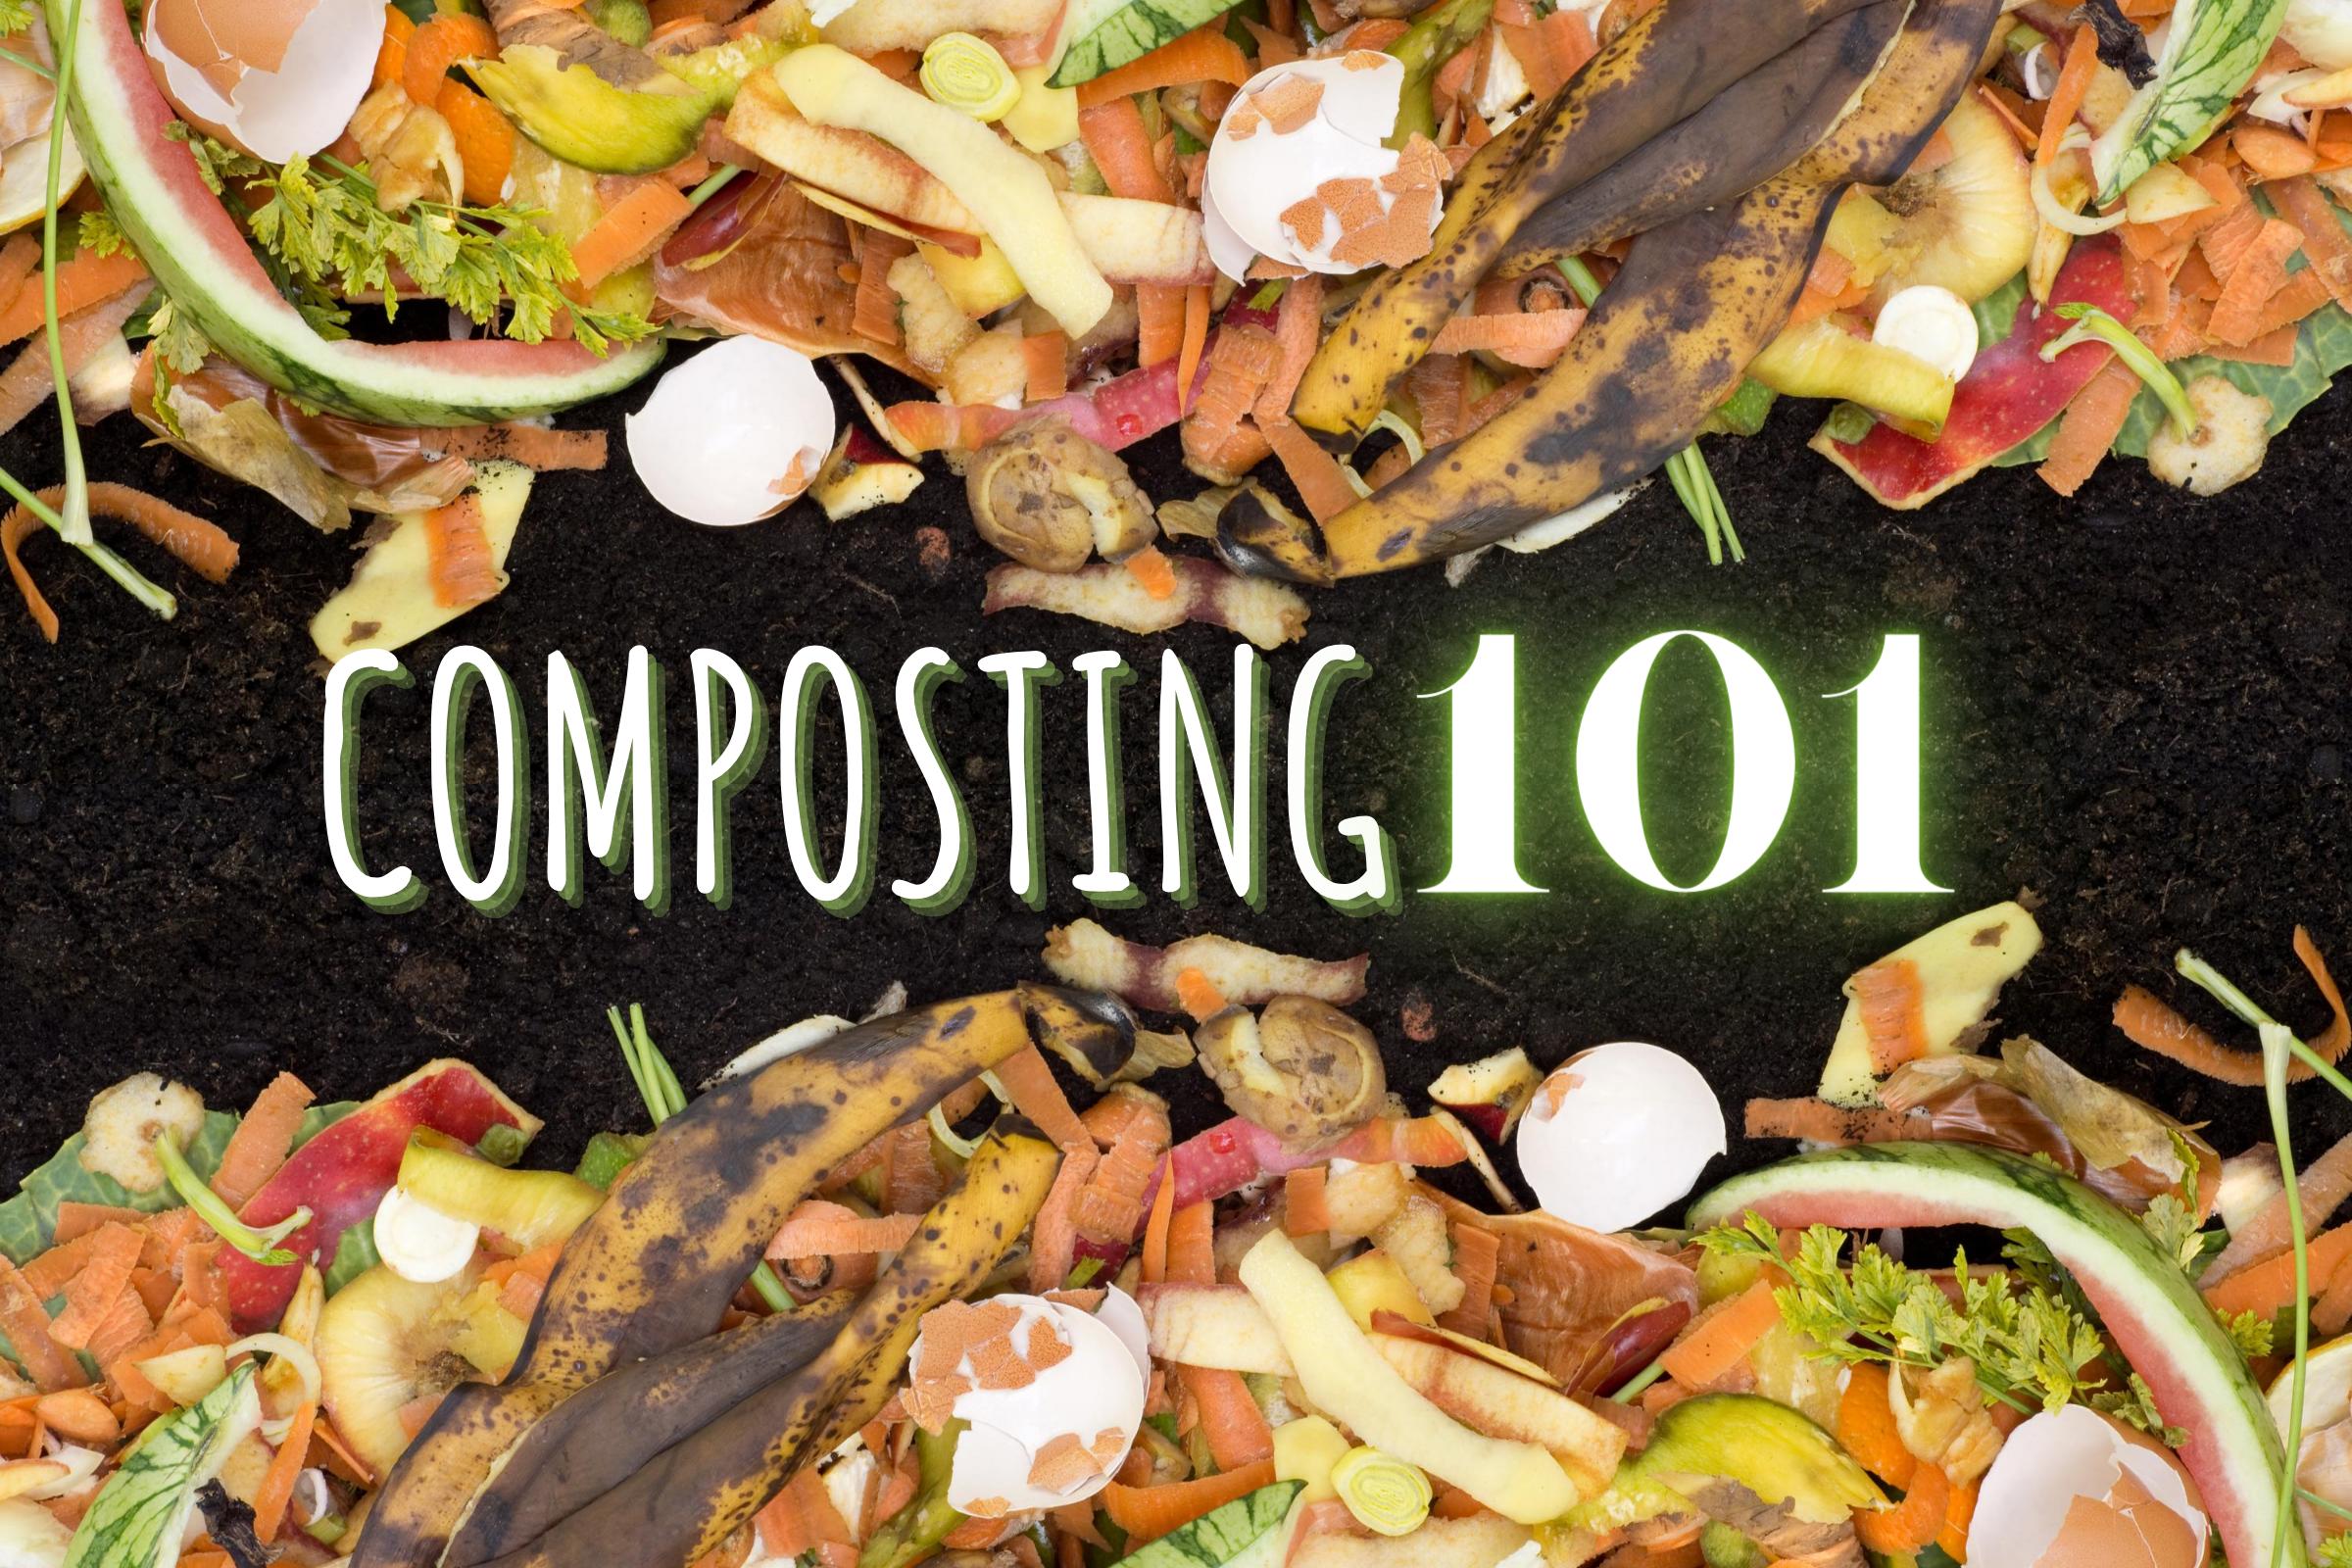 Composting 101—Start Composting Today!